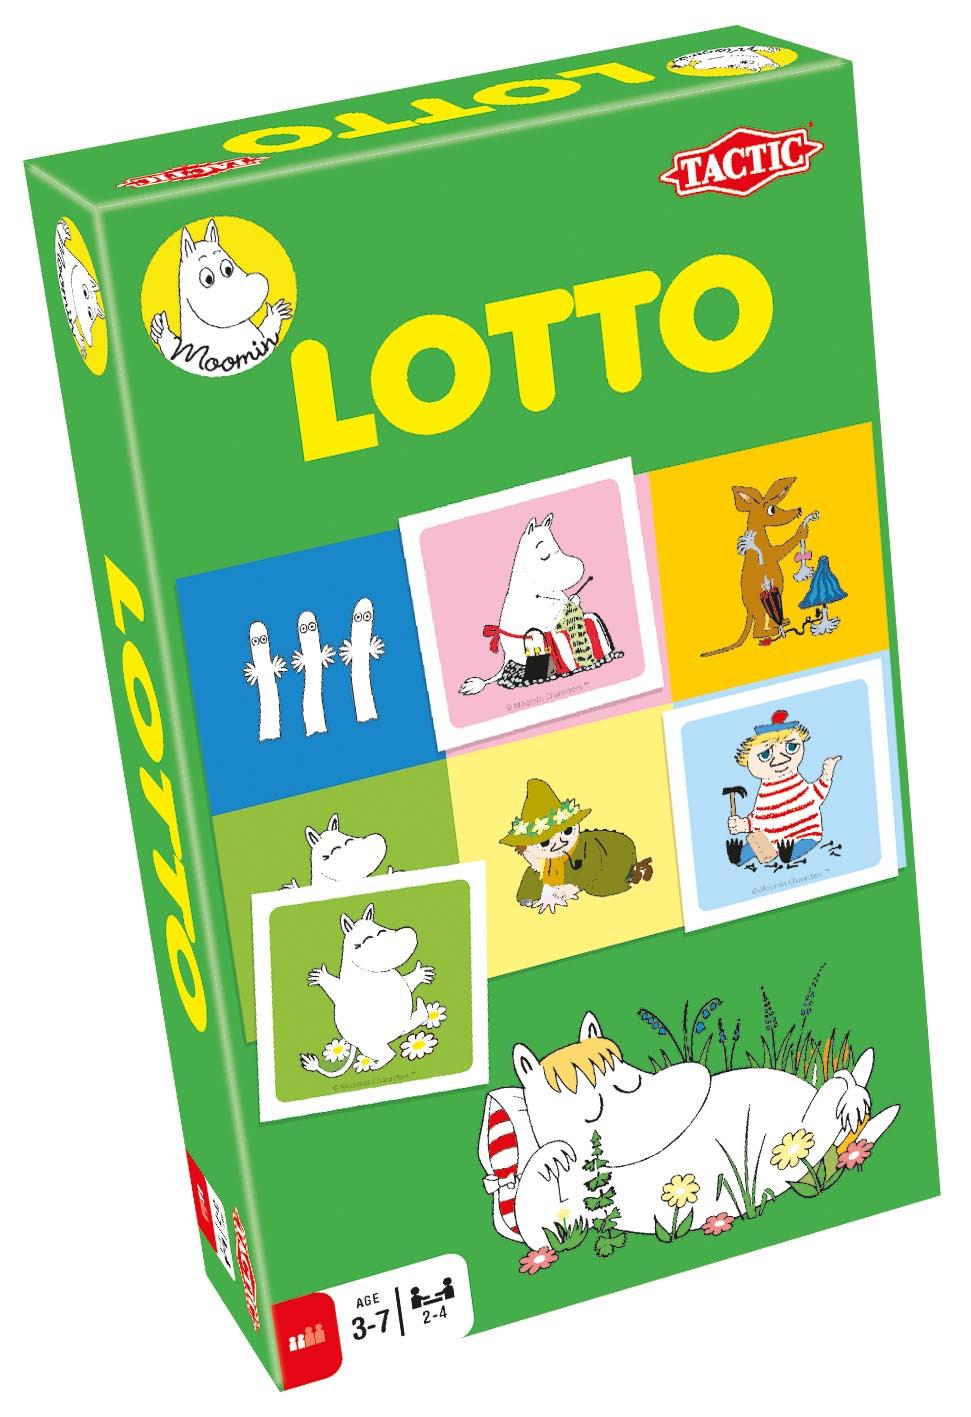 Tactic Travel Moomin Lotto